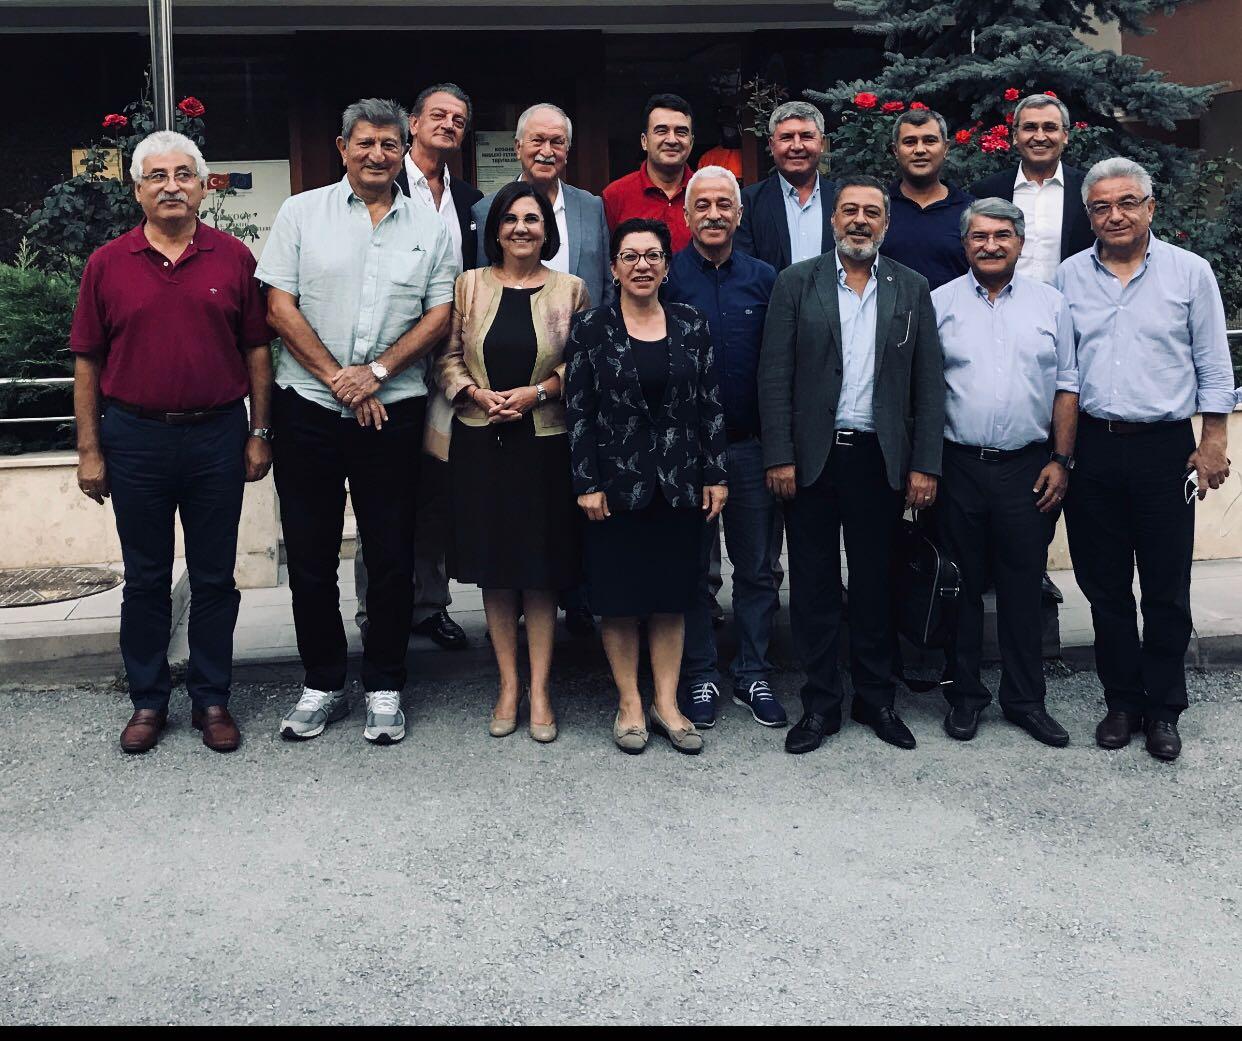 CHP'Lİ ESKİ VEKİLLER GÜVENOYU KURULTAYI İSTİYOR